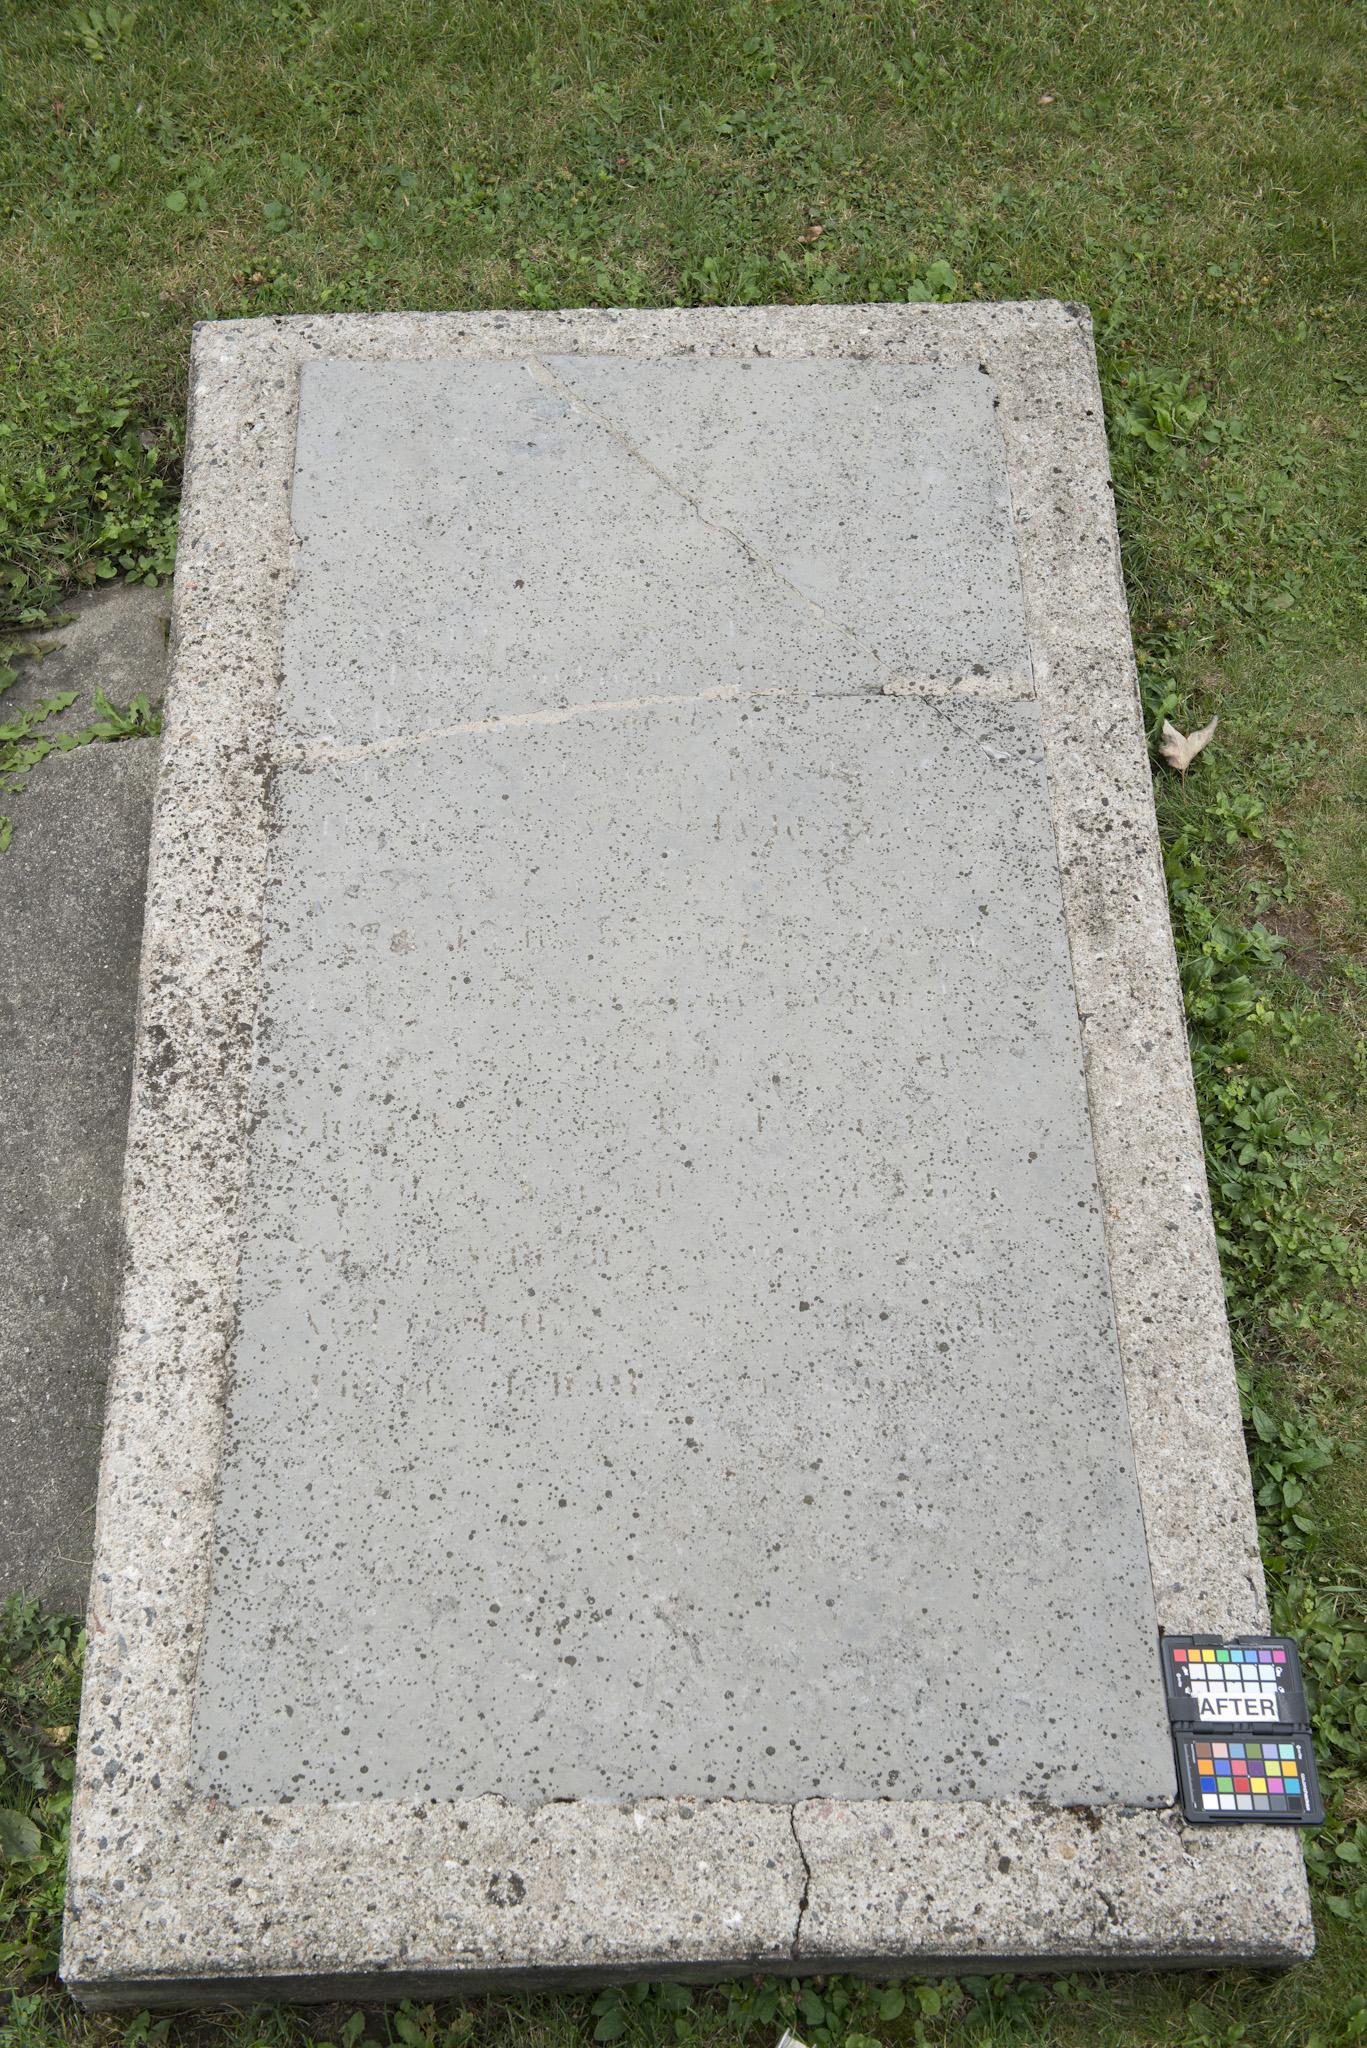 Marker for Mary Washburn (Alex Gabov)